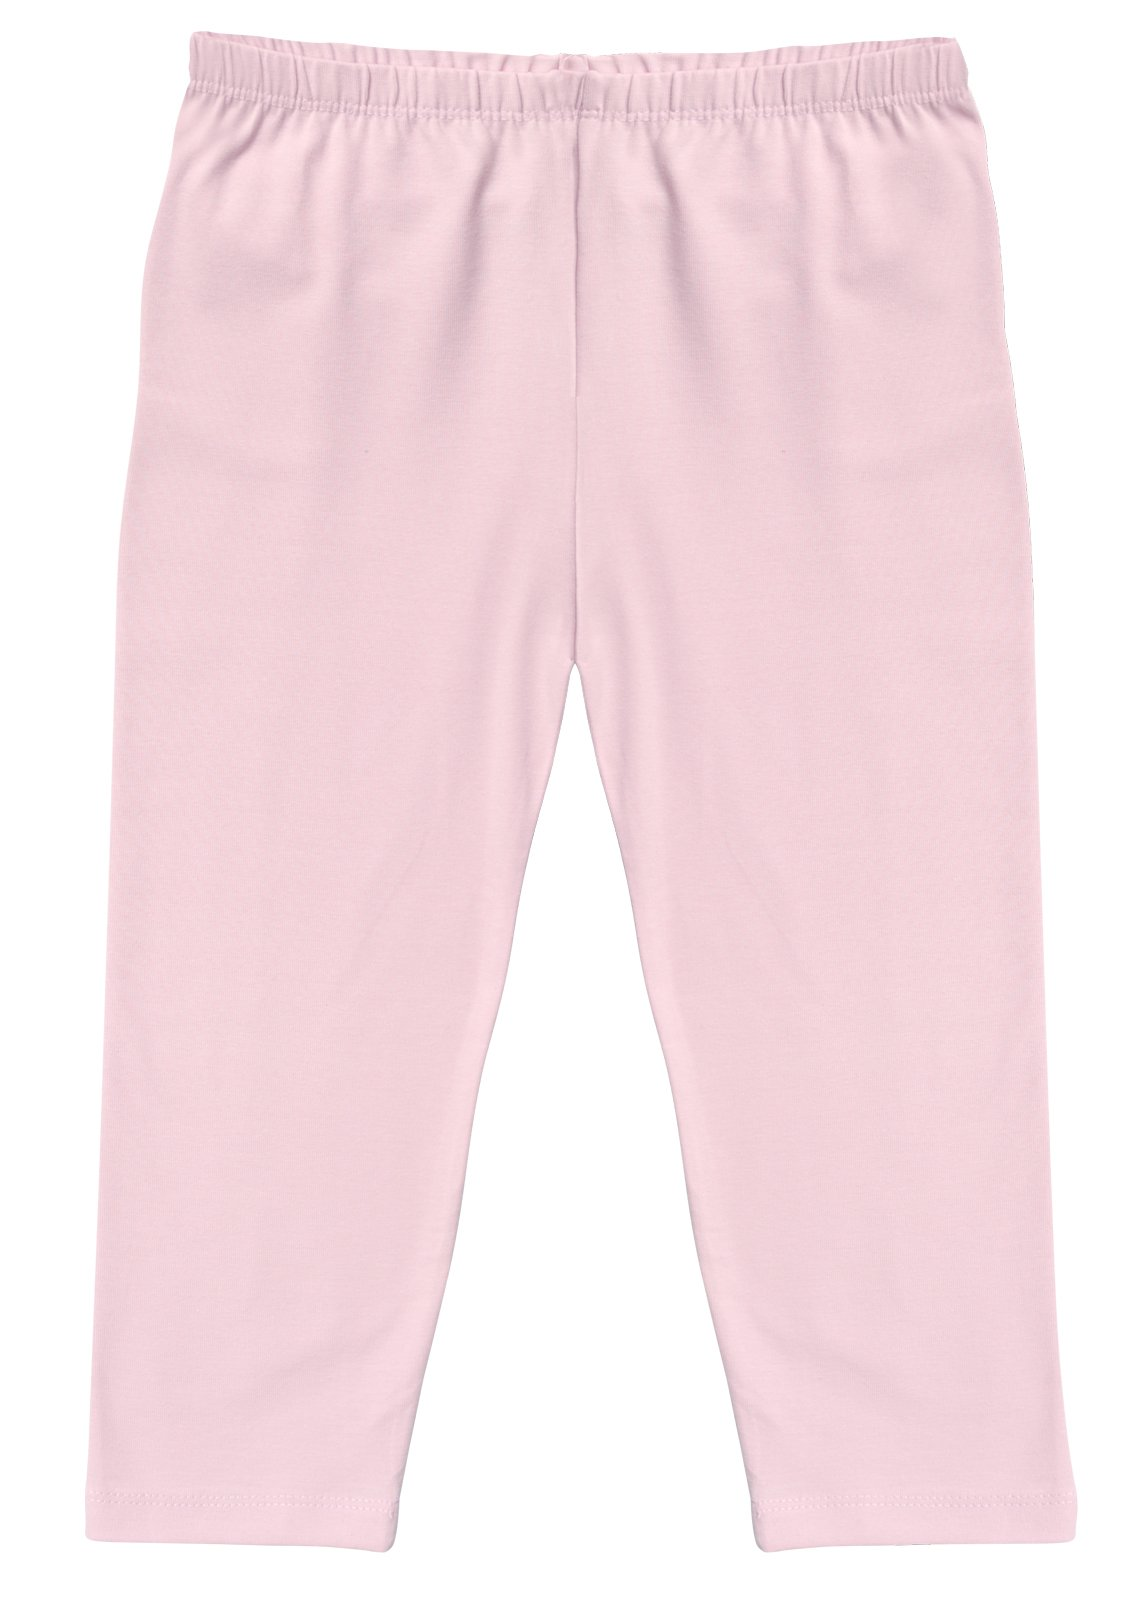 CAOMP Girl's Capri Crop Leggings, Organic Cotton Spandex, School or Play Pink 3 / 4